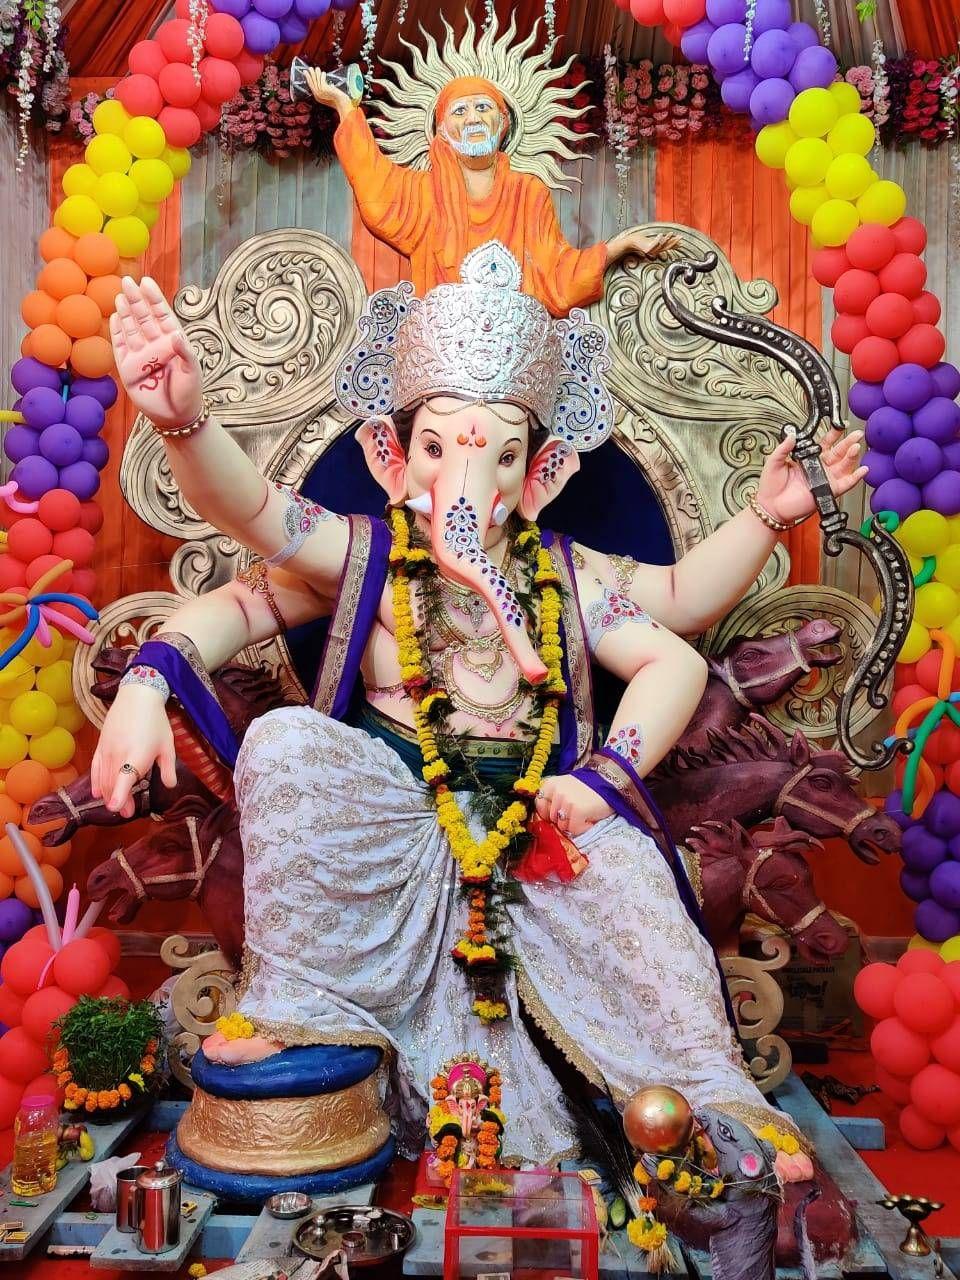 Ganesh Wallpaper by Jatin12585 85 Free on ZEDGE™ in